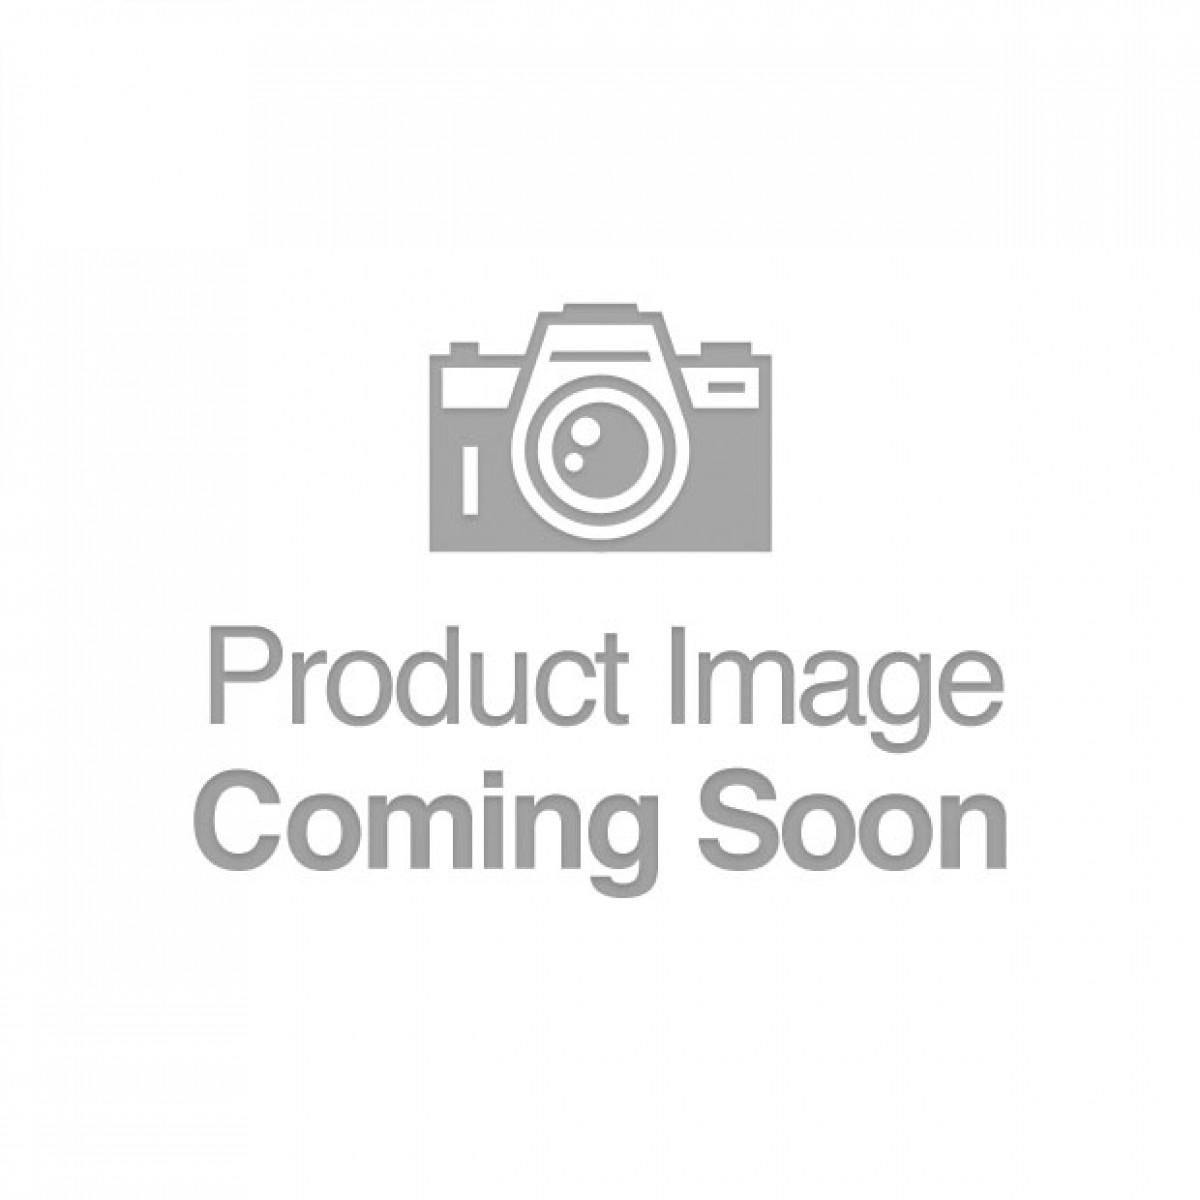 "Dorcel Real Vibration M 8.6"" Rechargeable Vibrator 2.0 - Black/Gold"